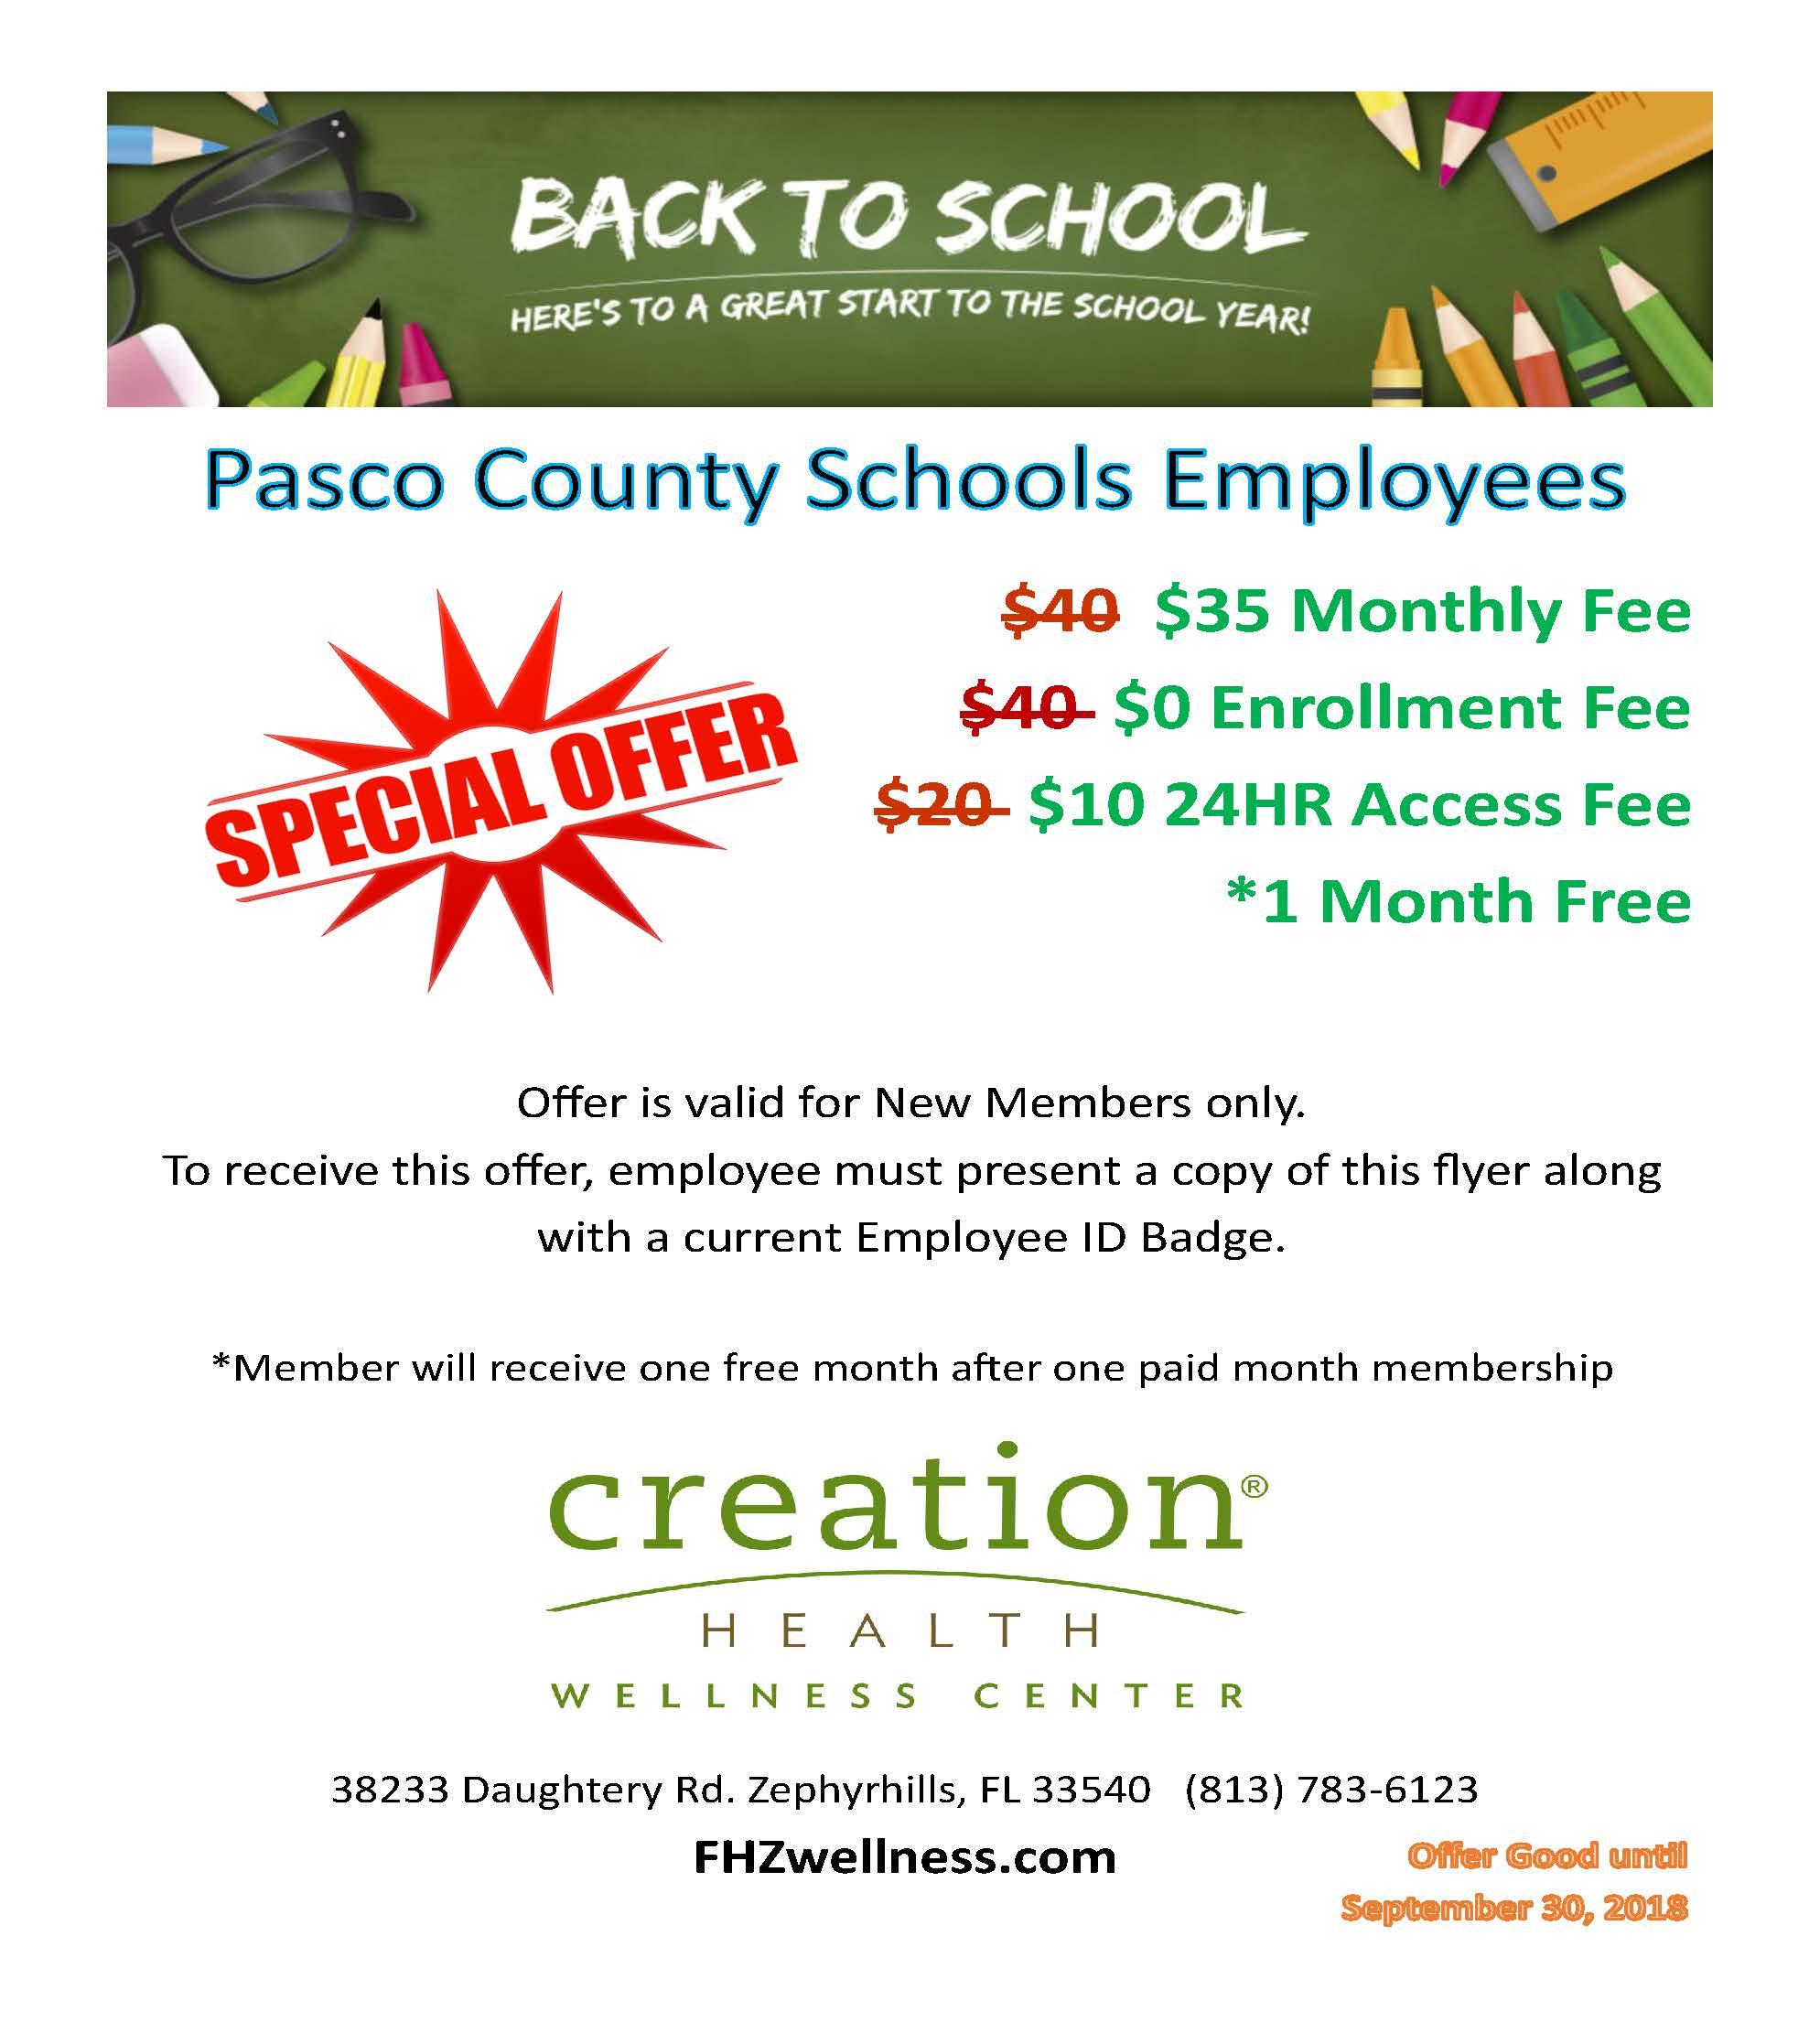 Ferman Chrysler Jeep Dodge Ram: Pasco County Schools